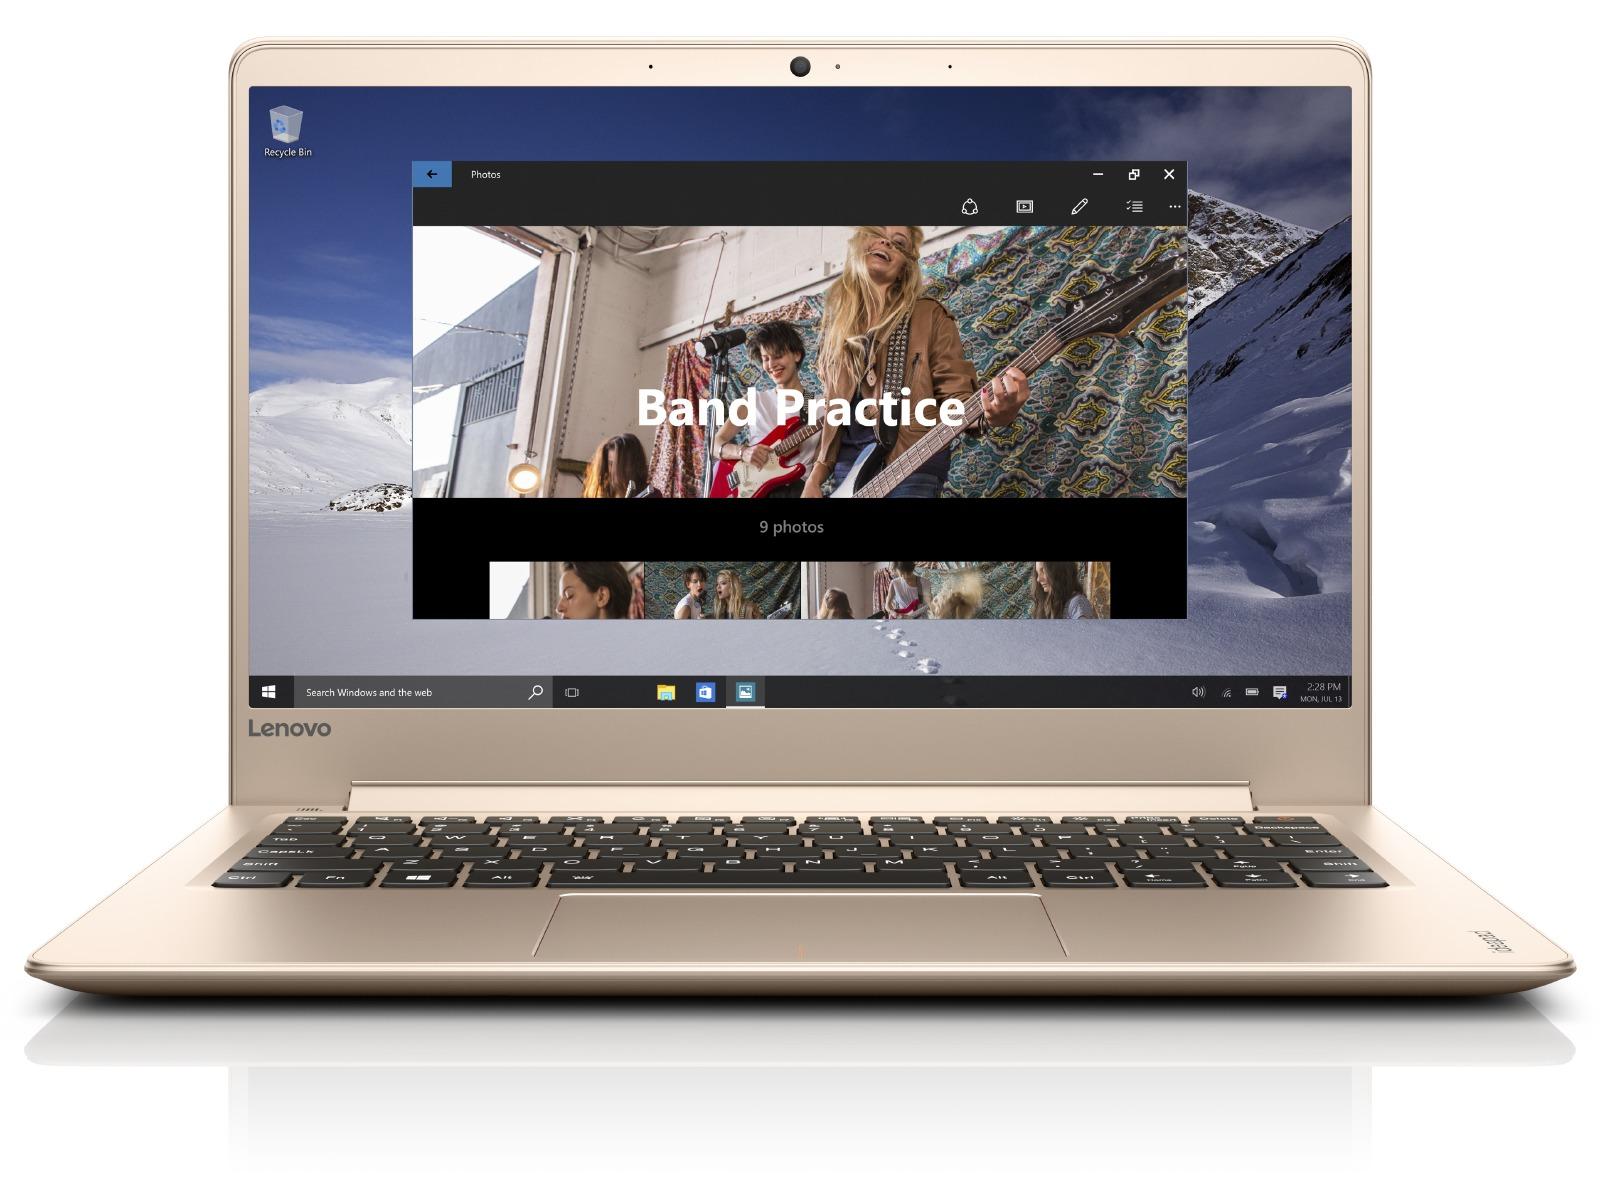 Lenovo IdeaPad 710S 13.3 FHD IPS AG/I7-7500U/256G SSD/8G/INT/W10 zlatý